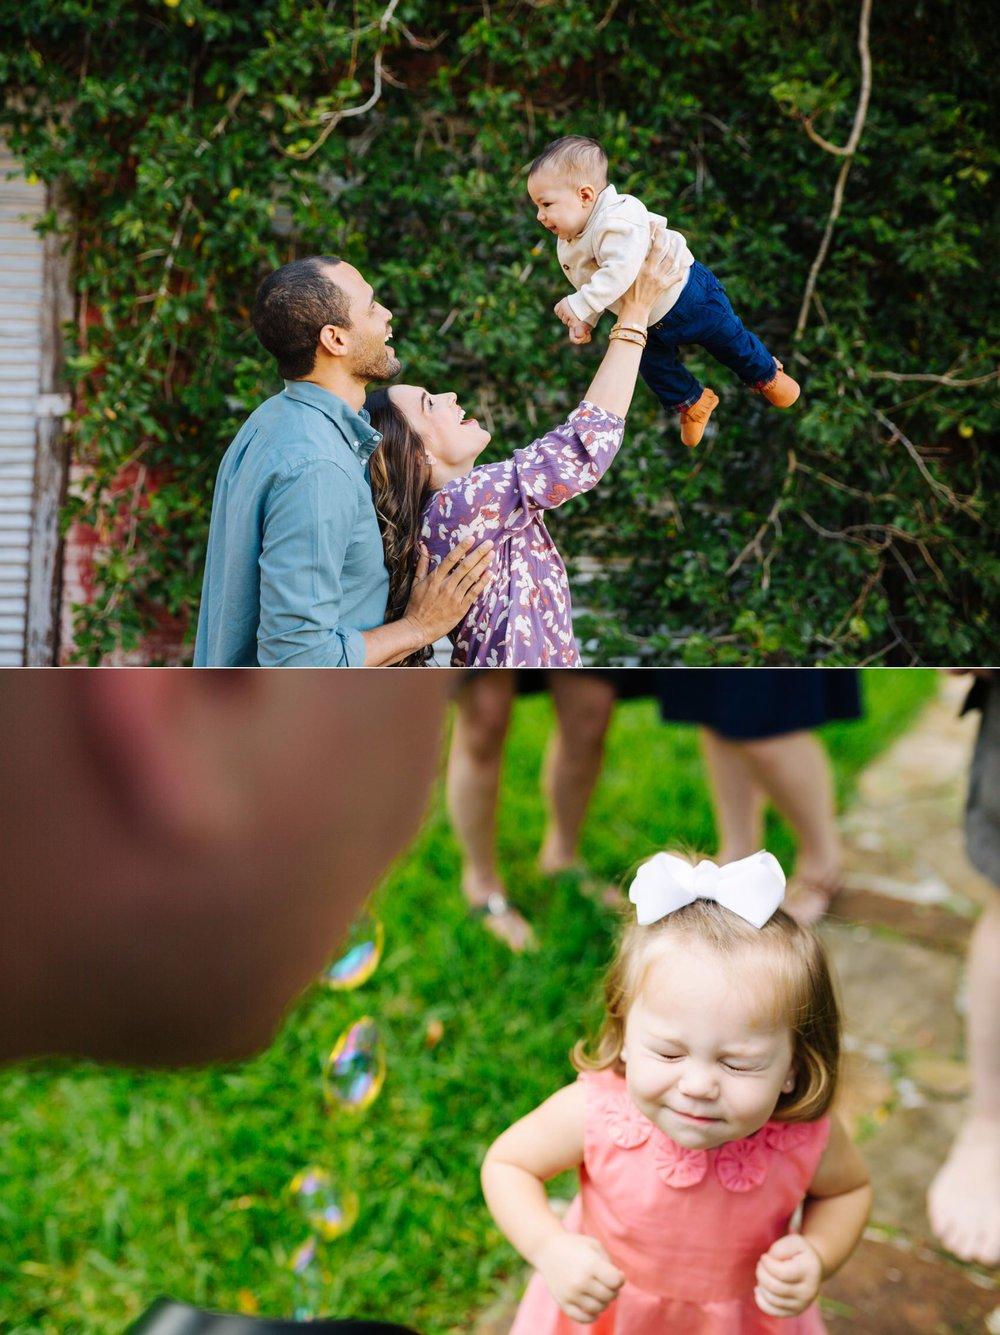 Jake & Katie's Best of Families 2016-008.jpg